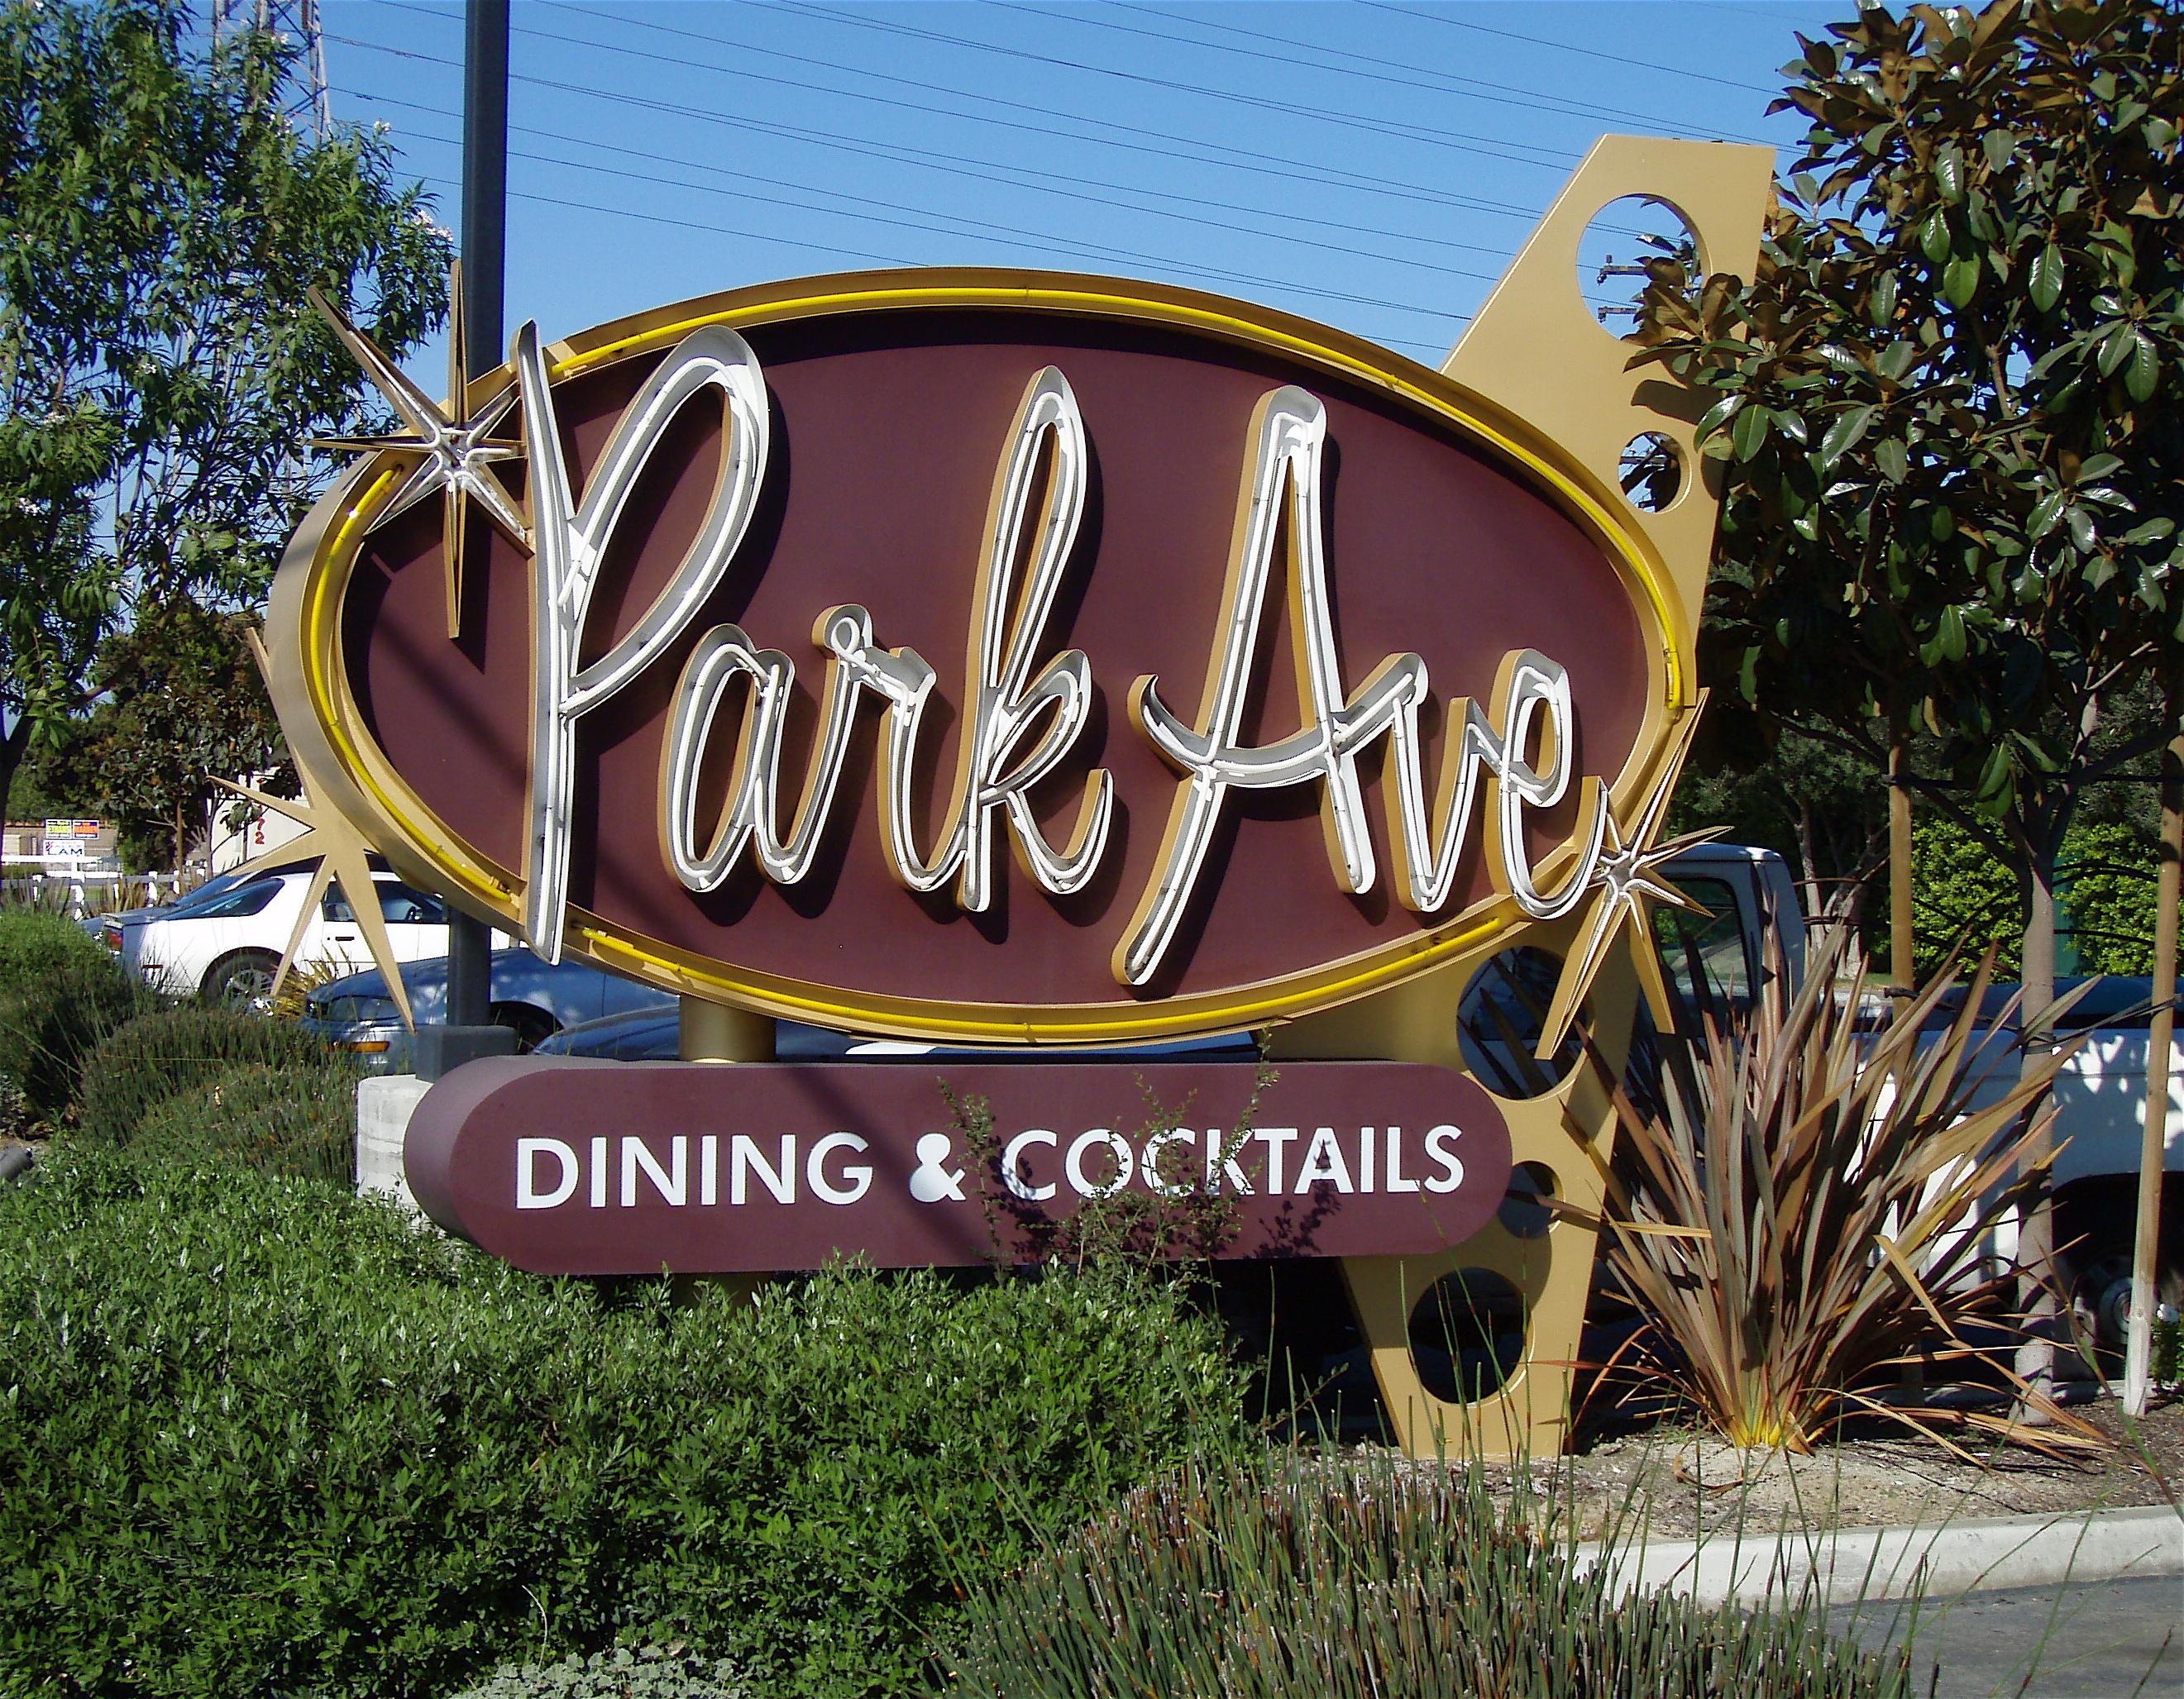 Park Avenue - 11200 Beach Boulevard, Stanton, California U.S.A. - October 24, 2008